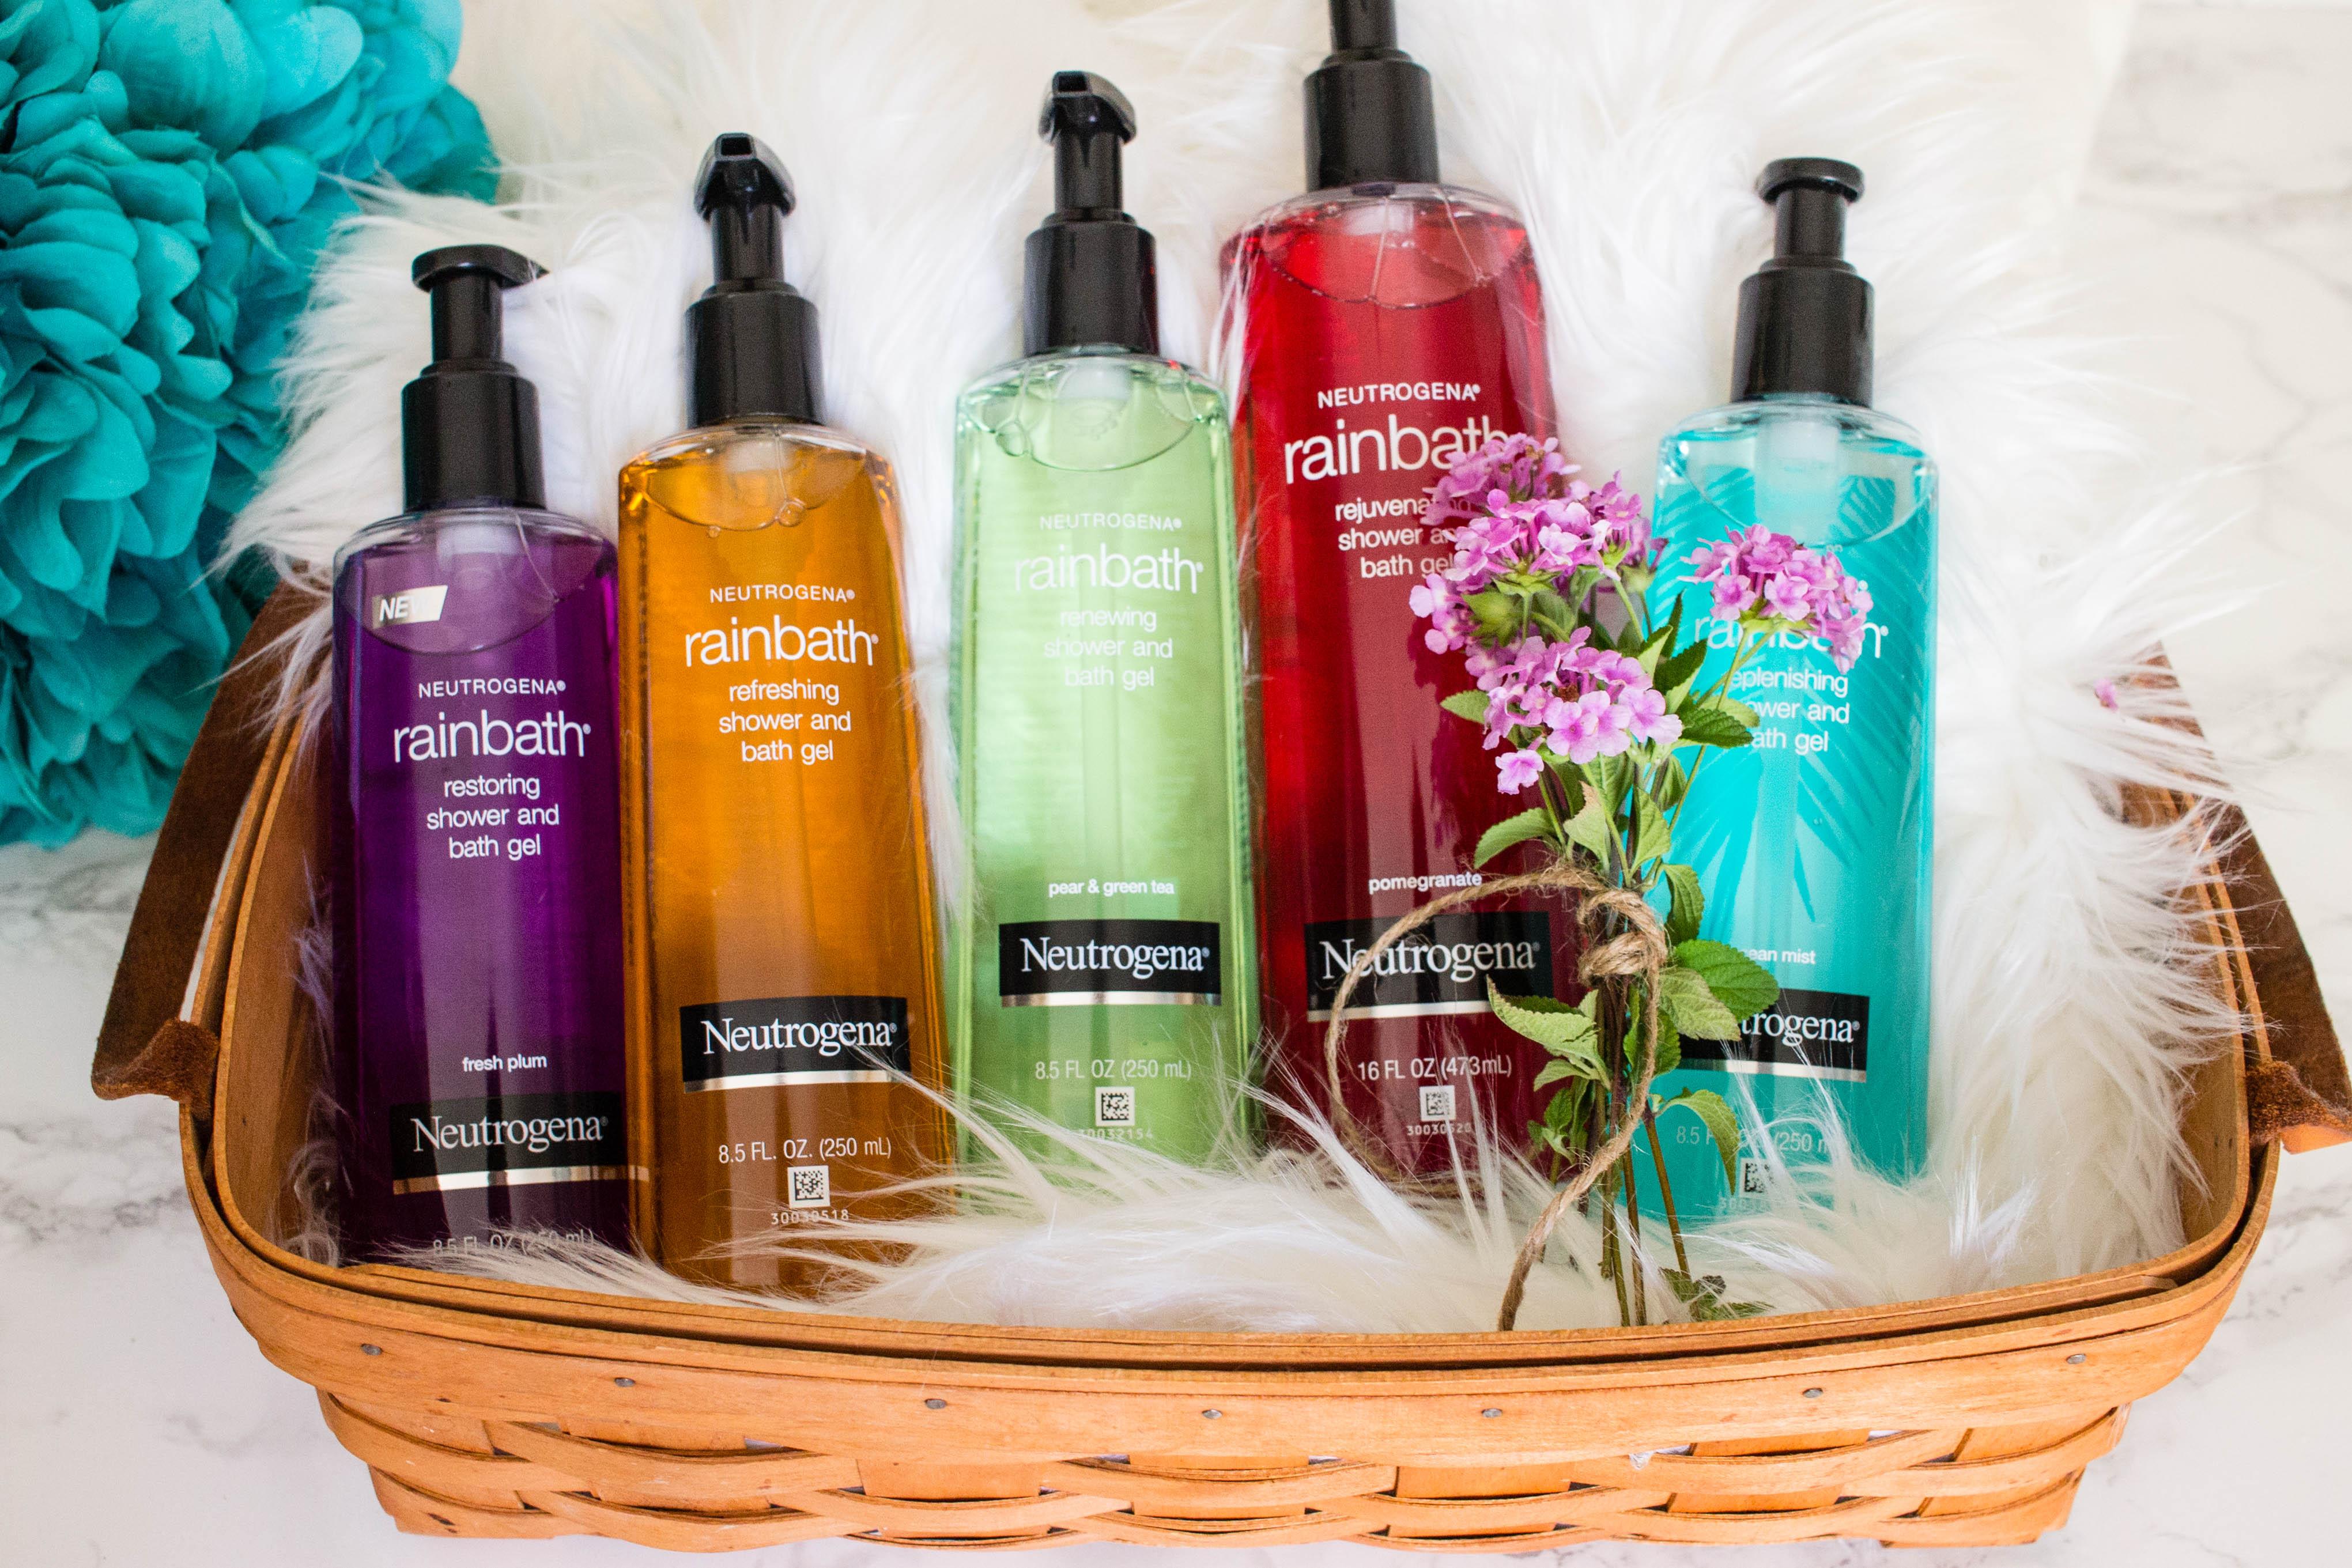 Neutrogena Rainbath 5 soothing bath and shower gel scents